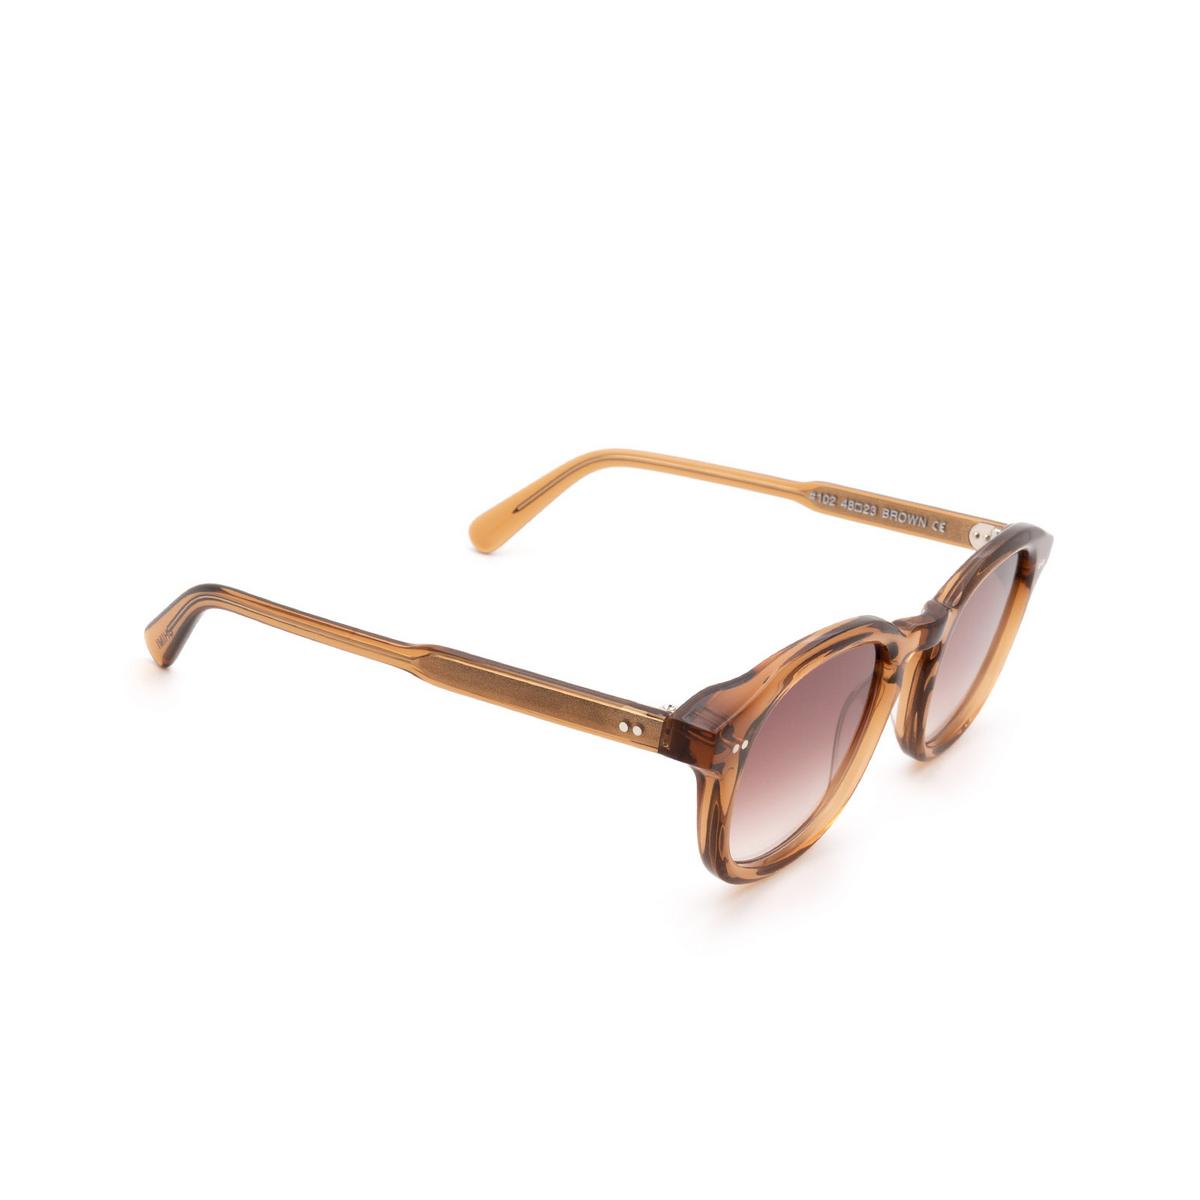 Chimi® Square Sunglasses: #102 color Brown Cinnamon Brown - three-quarters view.